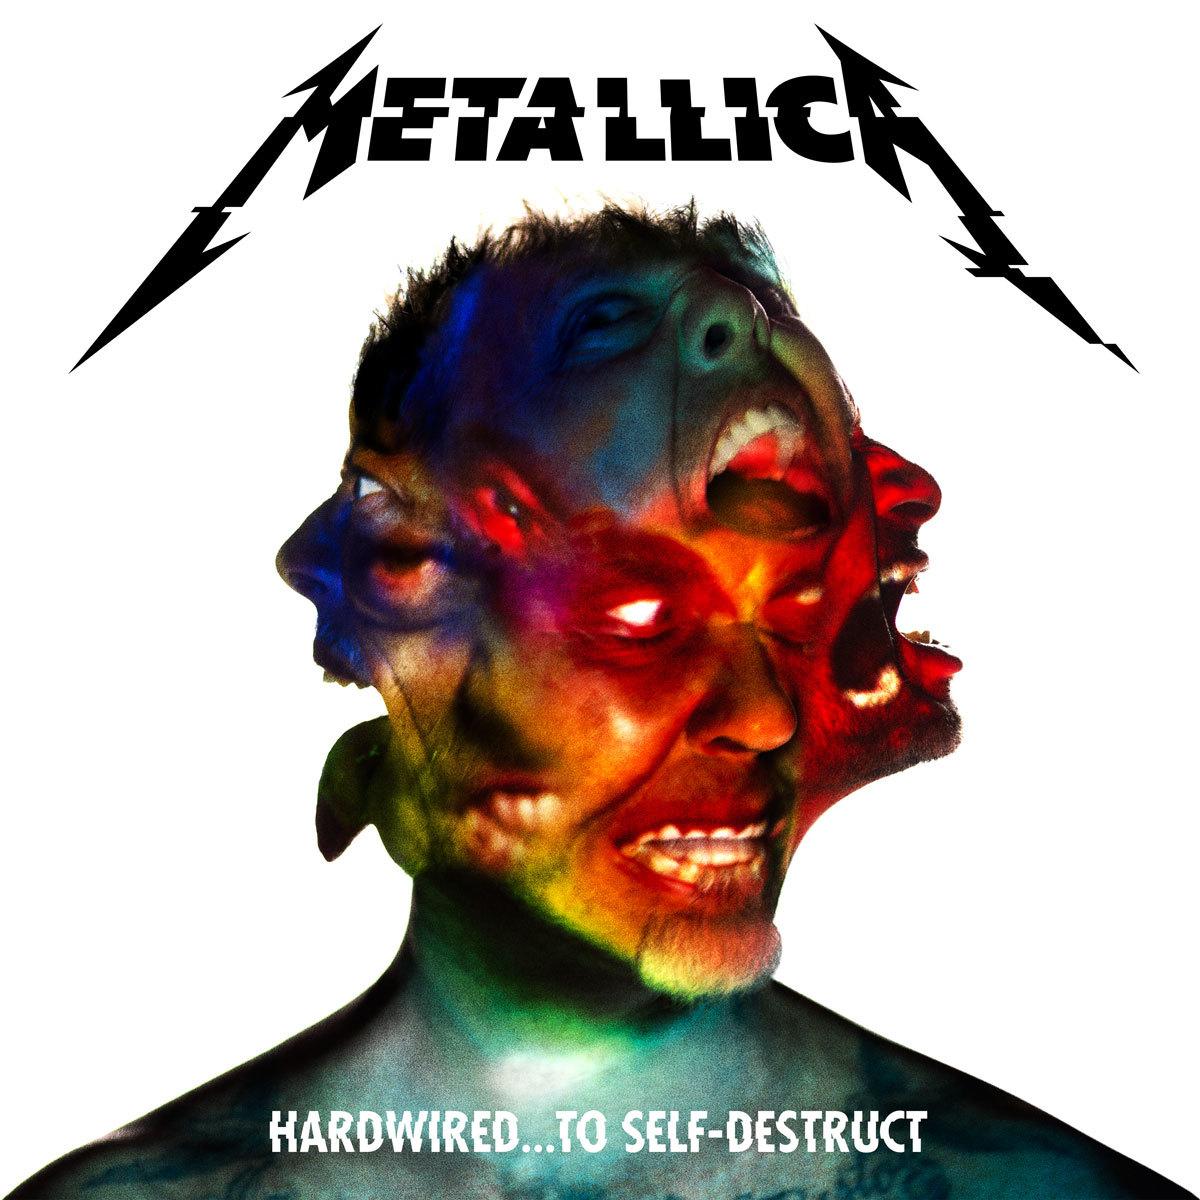 - Hardwired...To Self Destruct